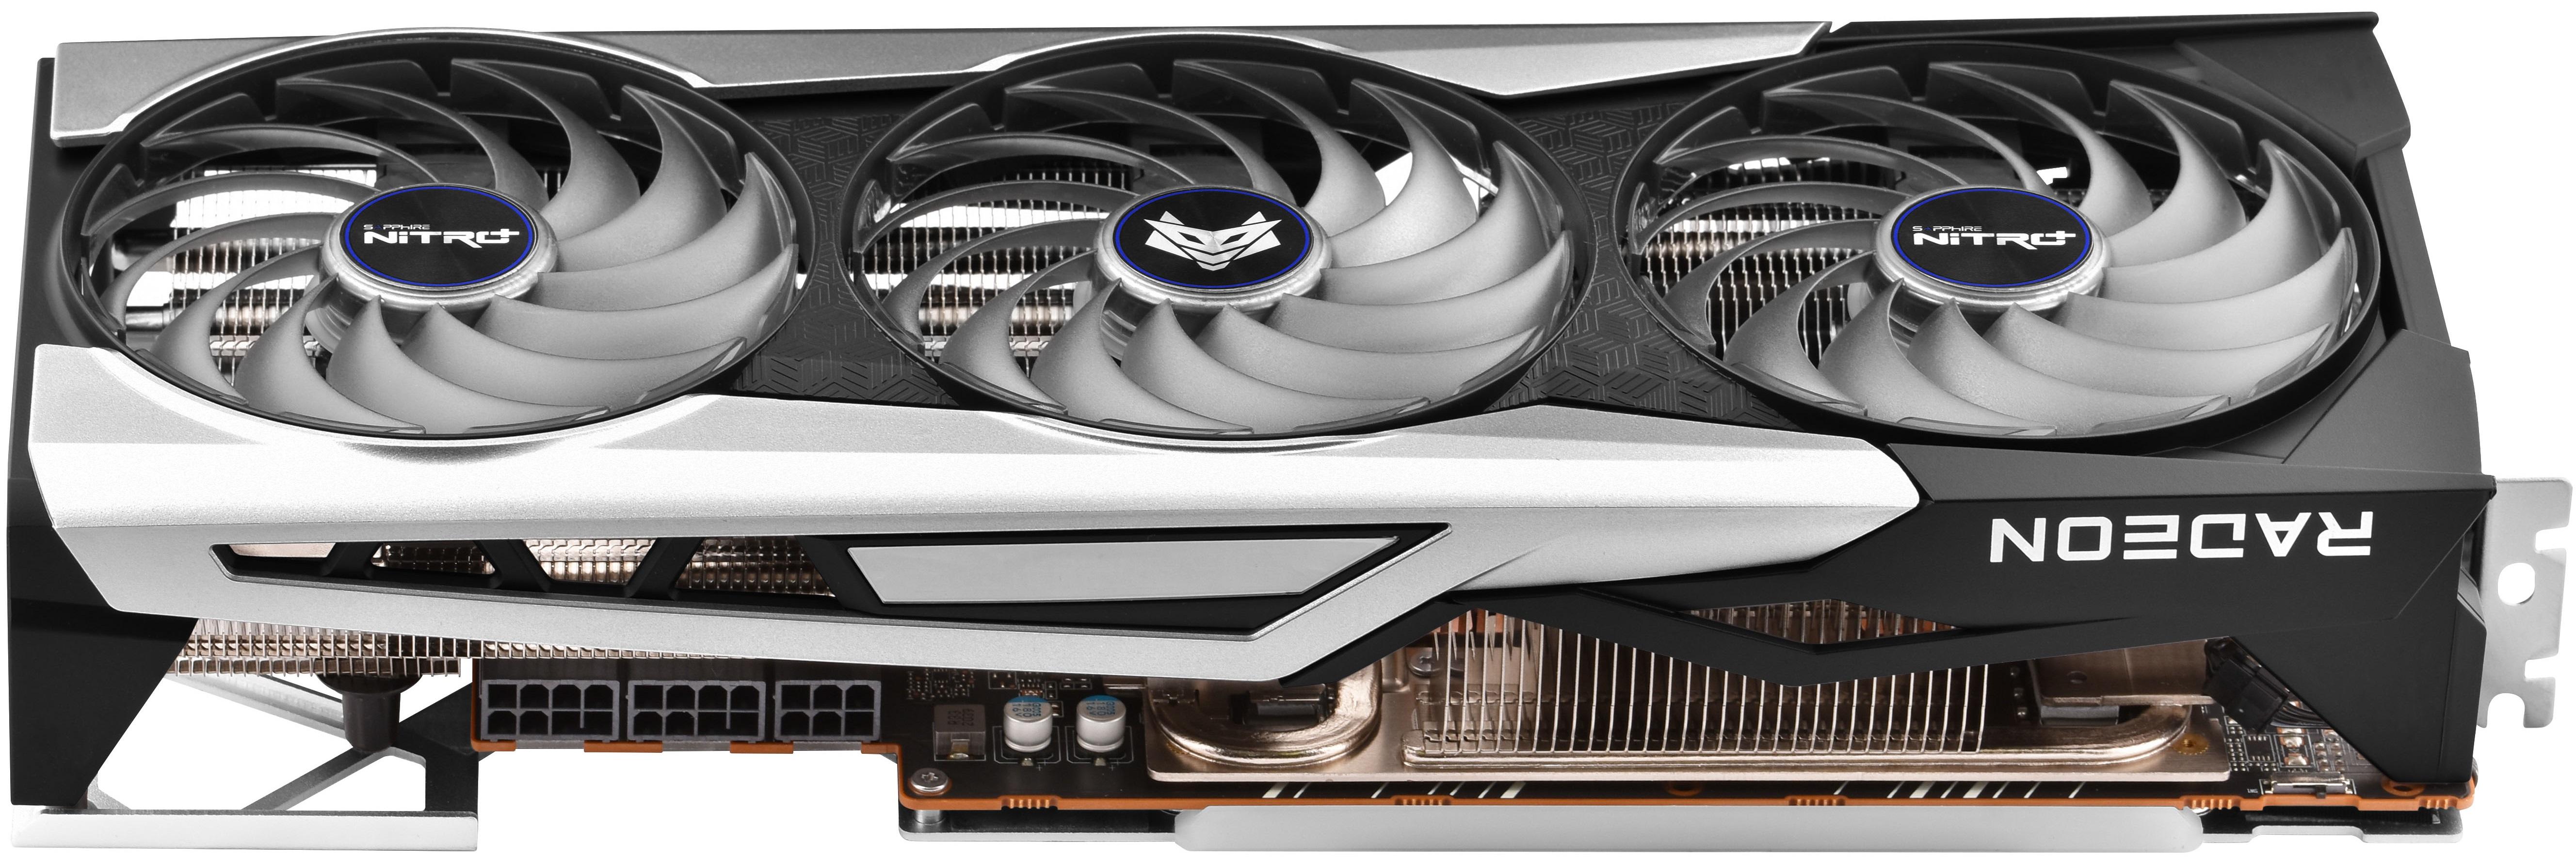 Sapphire Radeon RX 6900 XT Nitro+ Special Edition